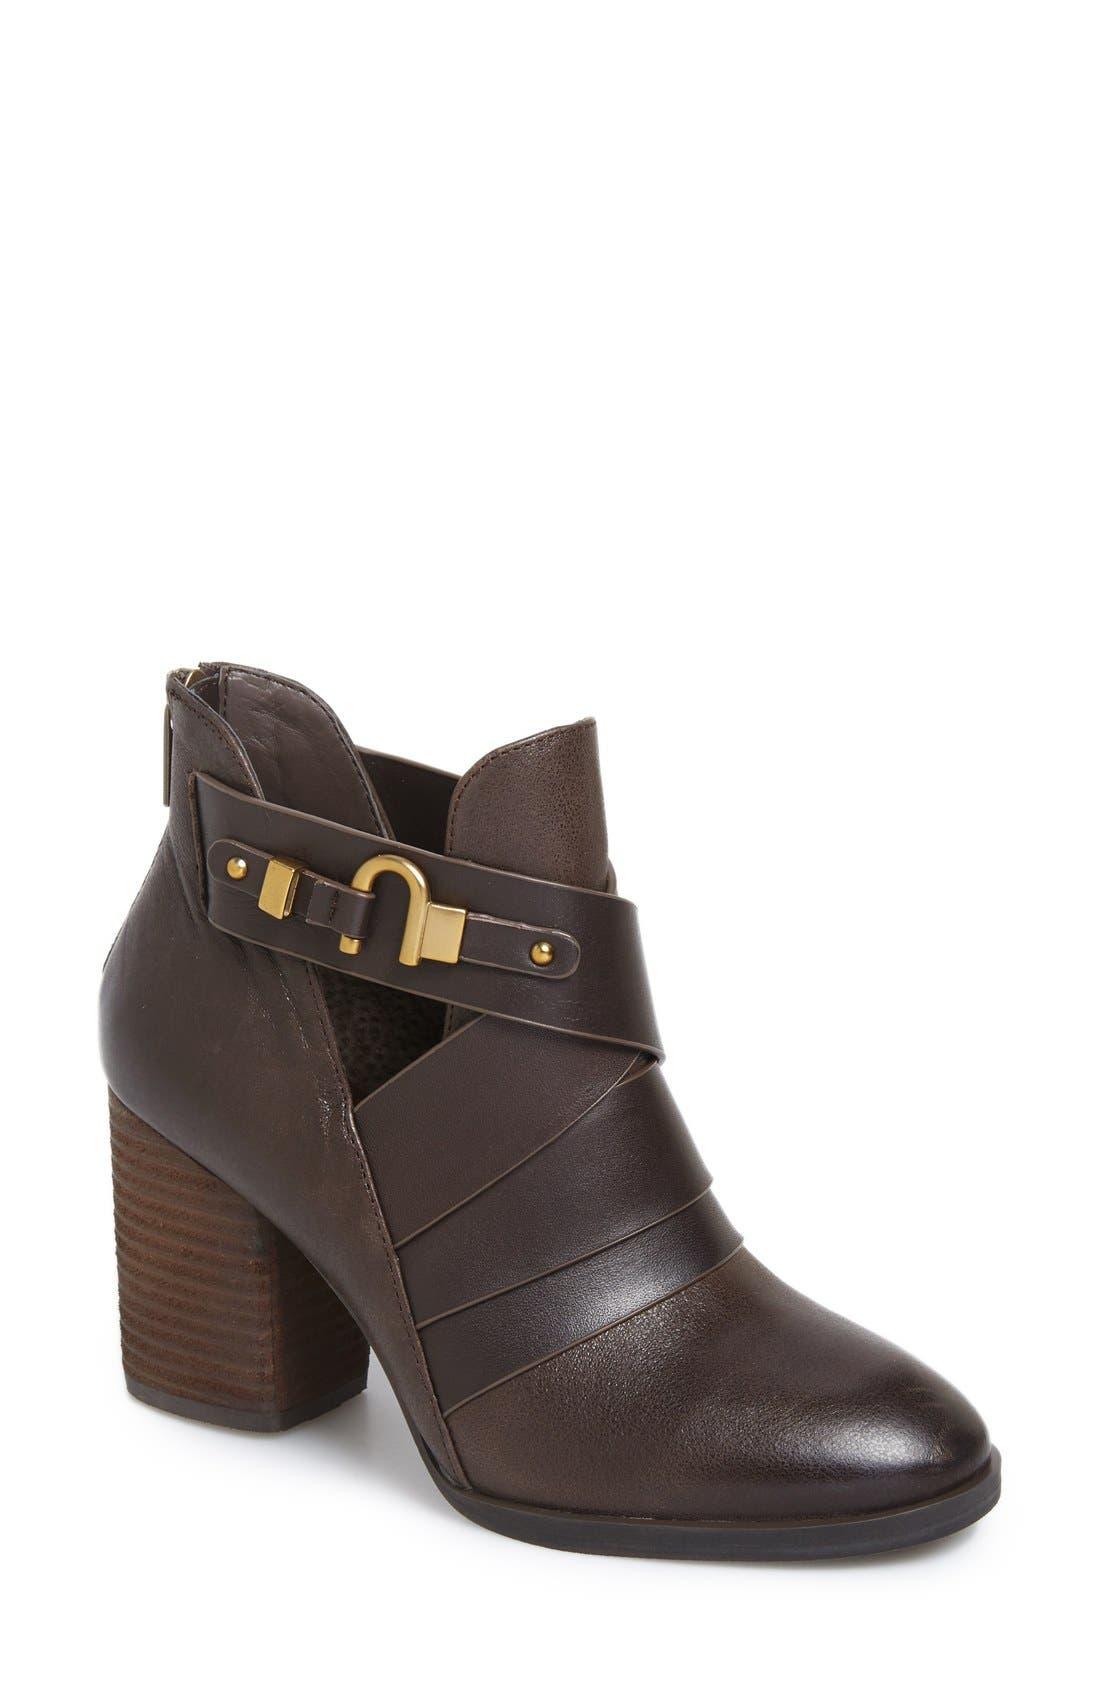 Isolà 'Ladora' Block Heel Bootie,                             Main thumbnail 1, color,                             Dark Brown Leather